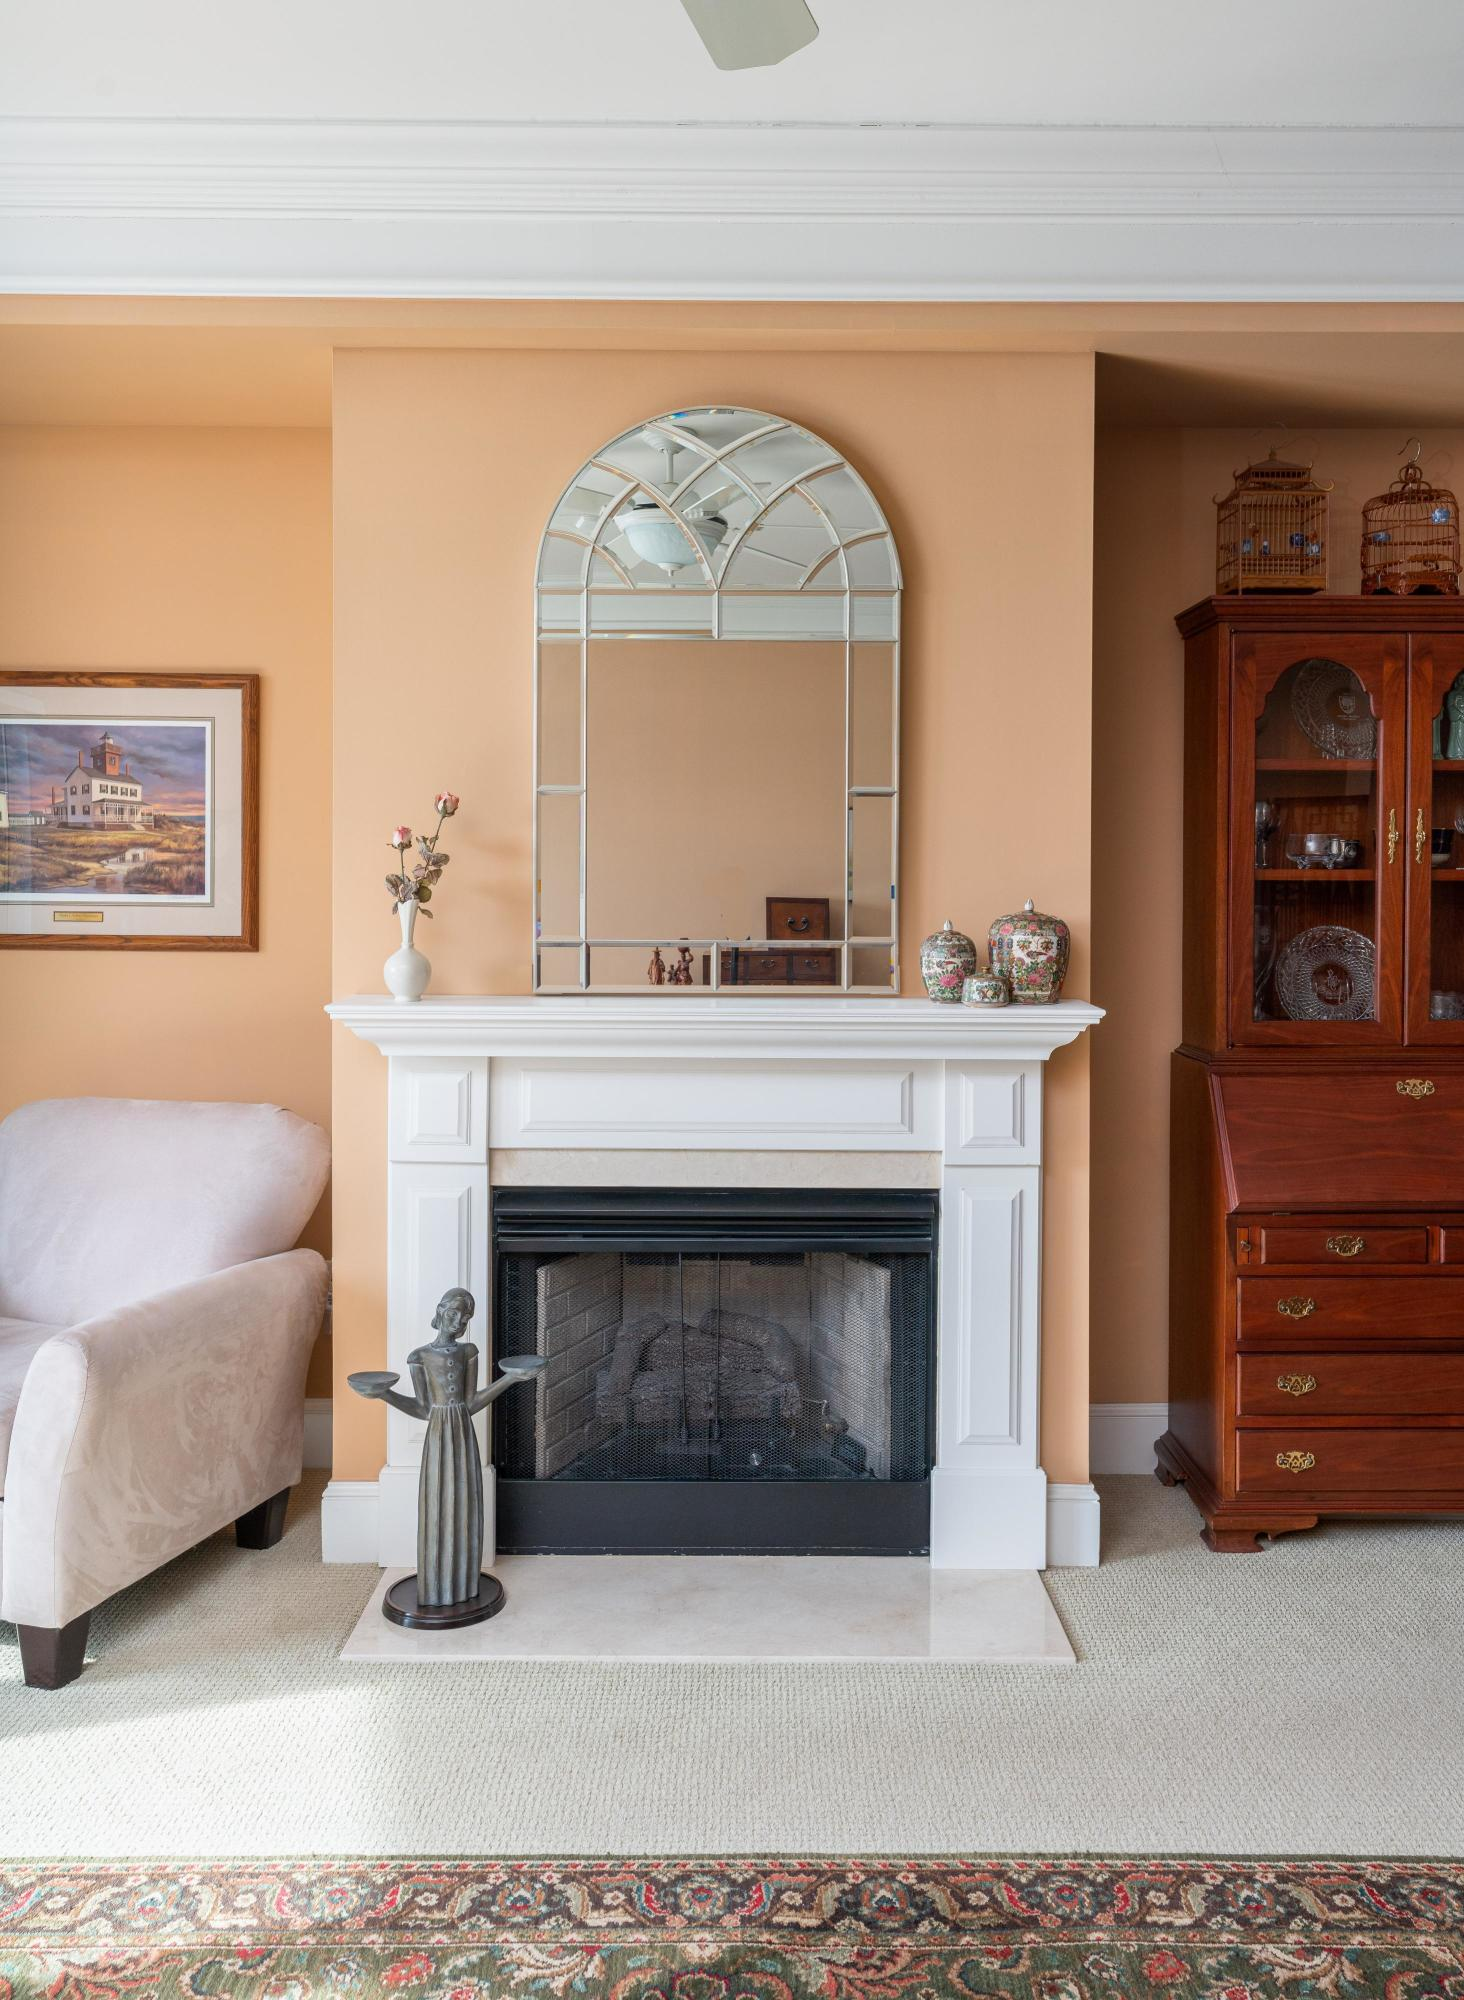 Renaissance On Chas Harbor Homes For Sale - 134 Plaza, Mount Pleasant, SC - 4